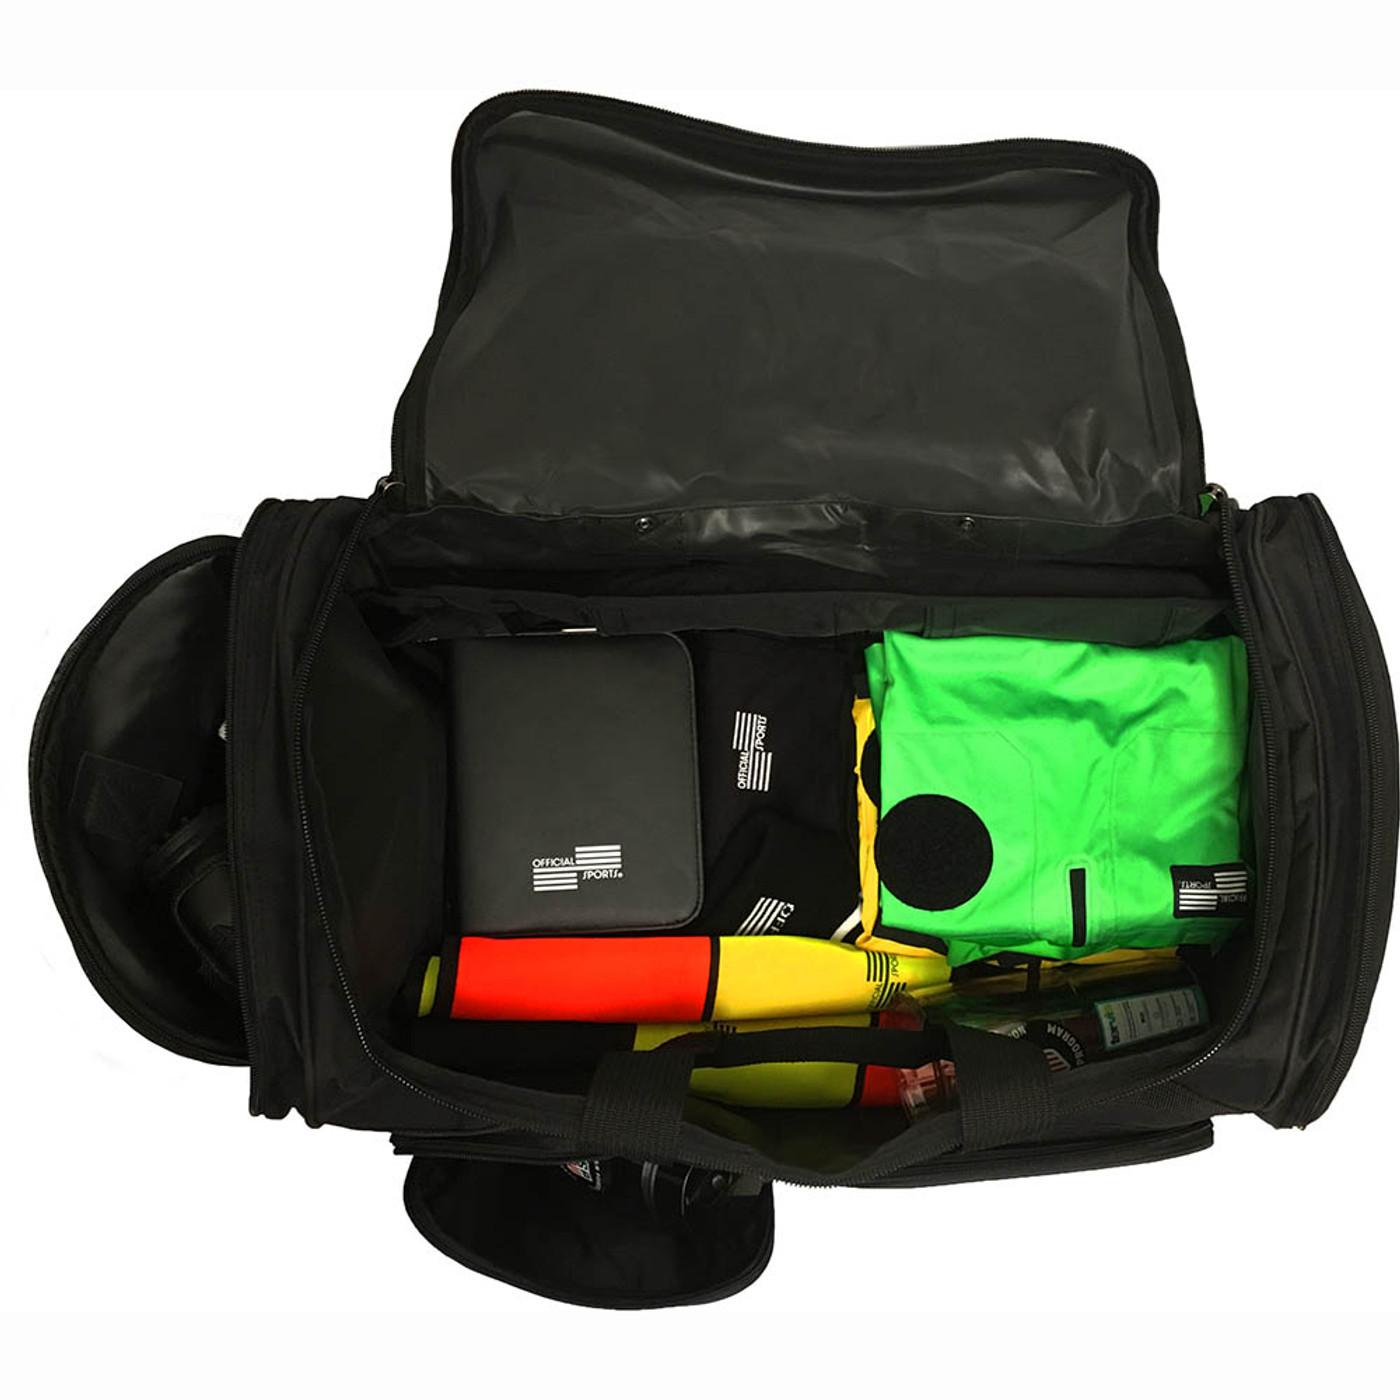 1630 The Superior Black Bag